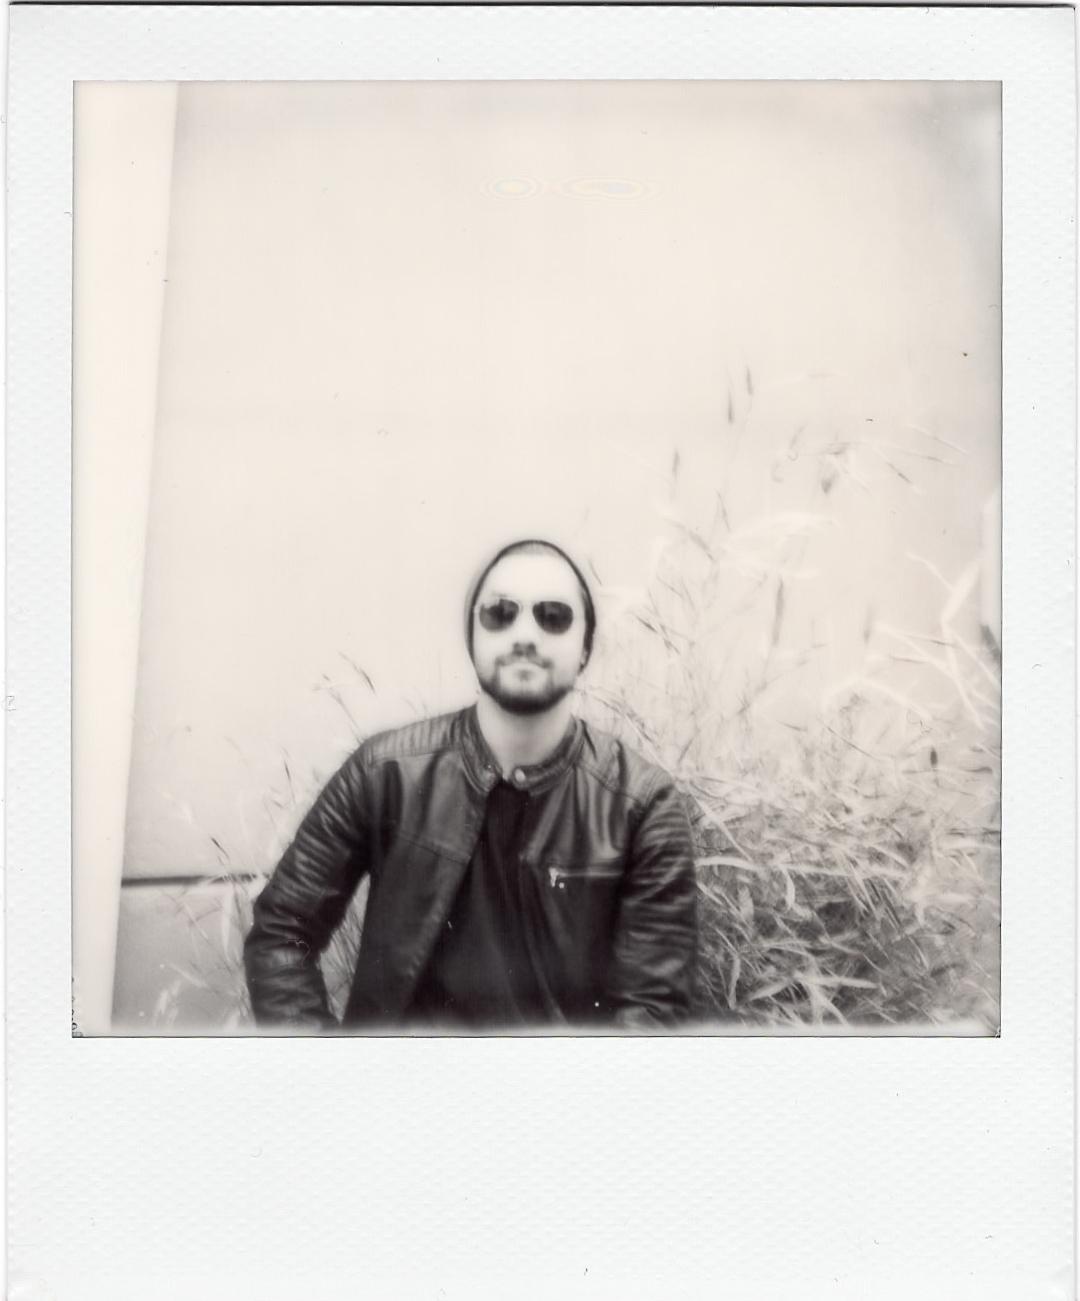 Polaroids-19.jpg